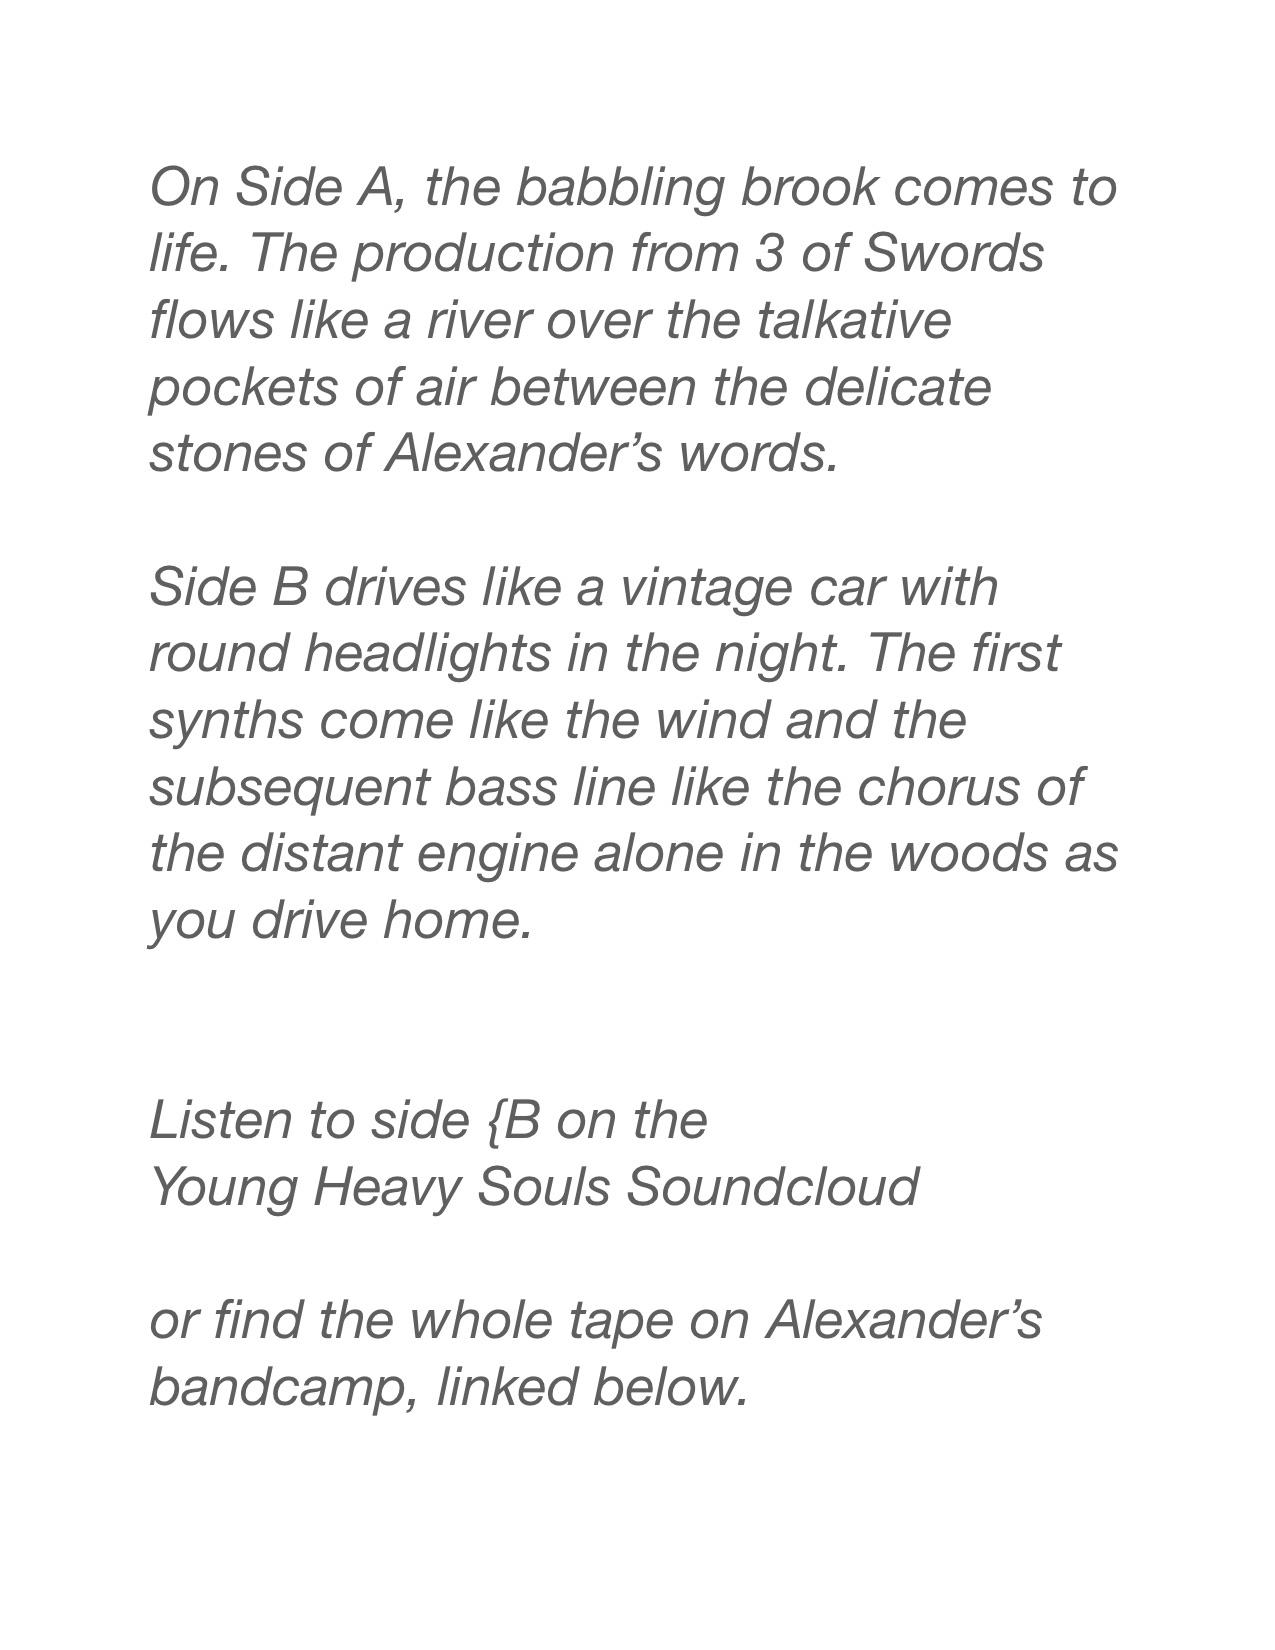 axelwalsh.bandcamp.com  https://soundcloud.com/young-heavy-souls/alex-walsh-un-reve-premonitoire